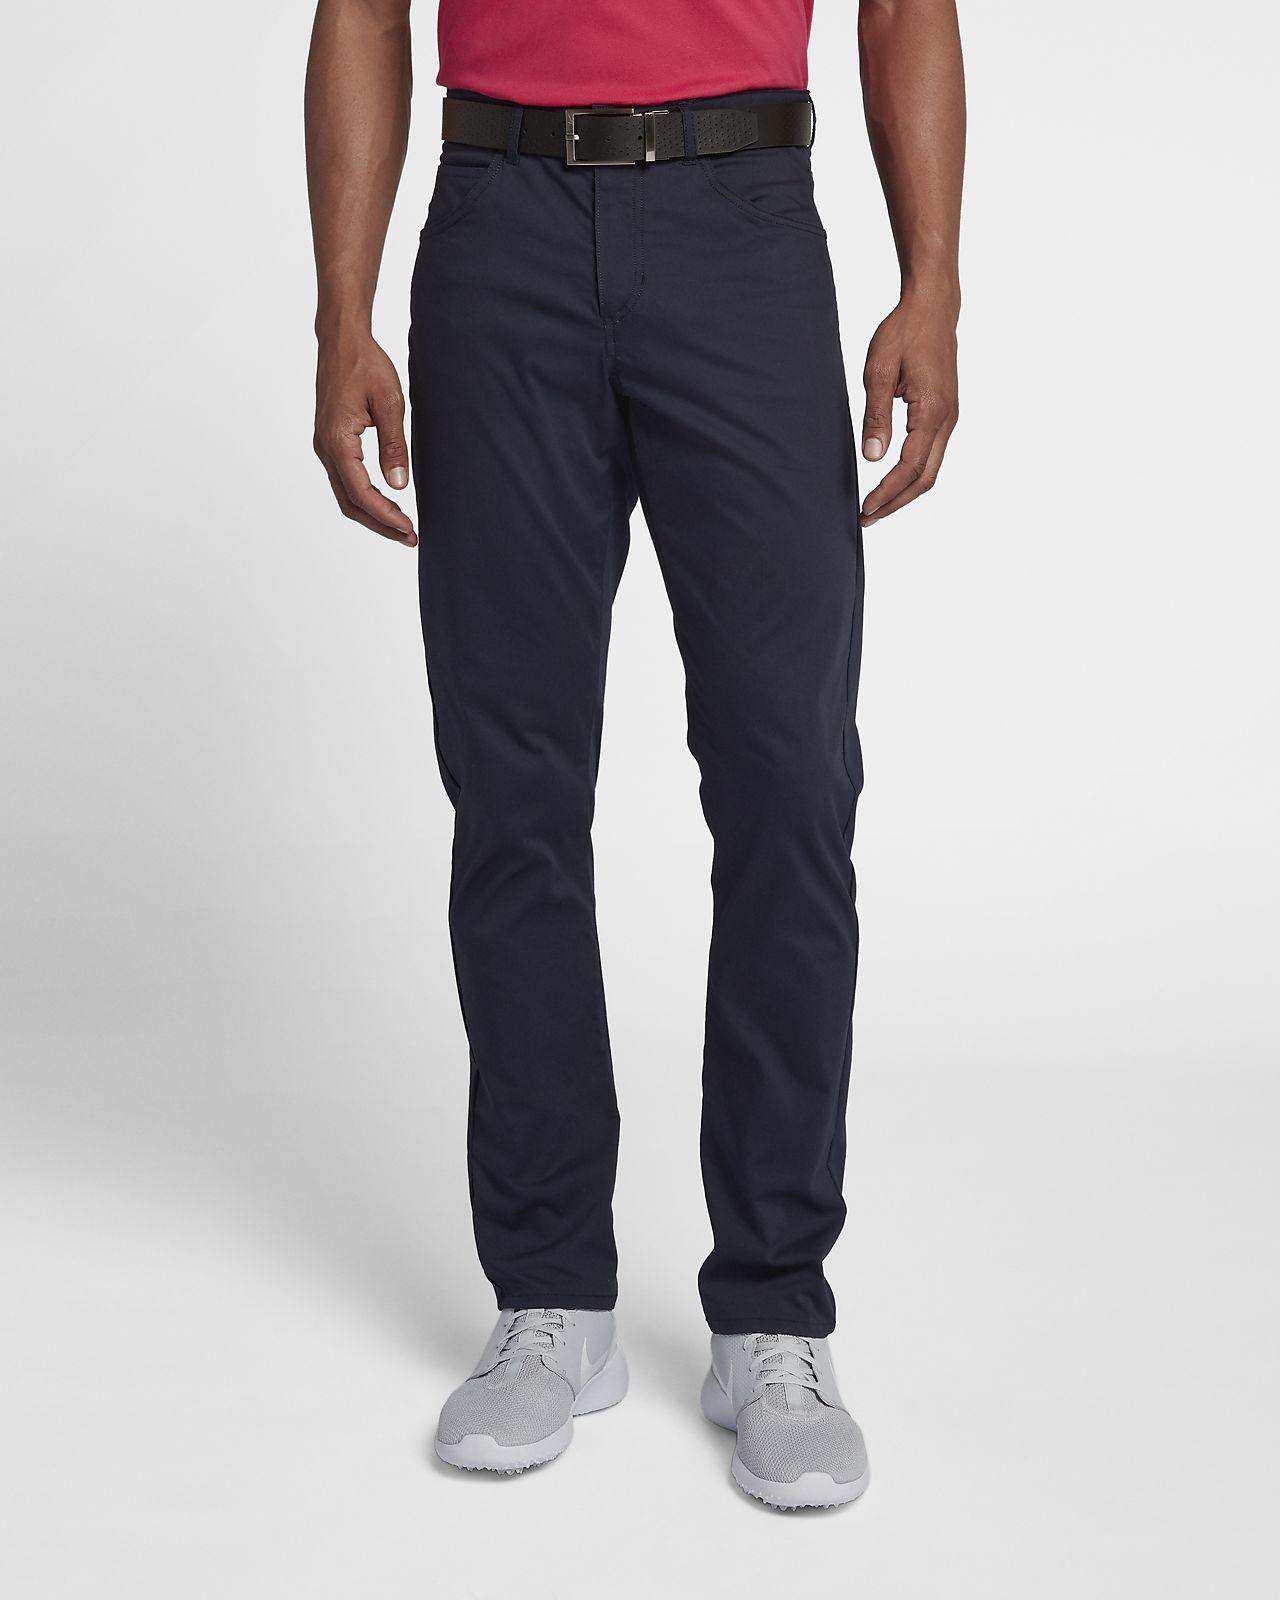 Nike Flex Men's Slim Fit 5 Pocket Golf Pants